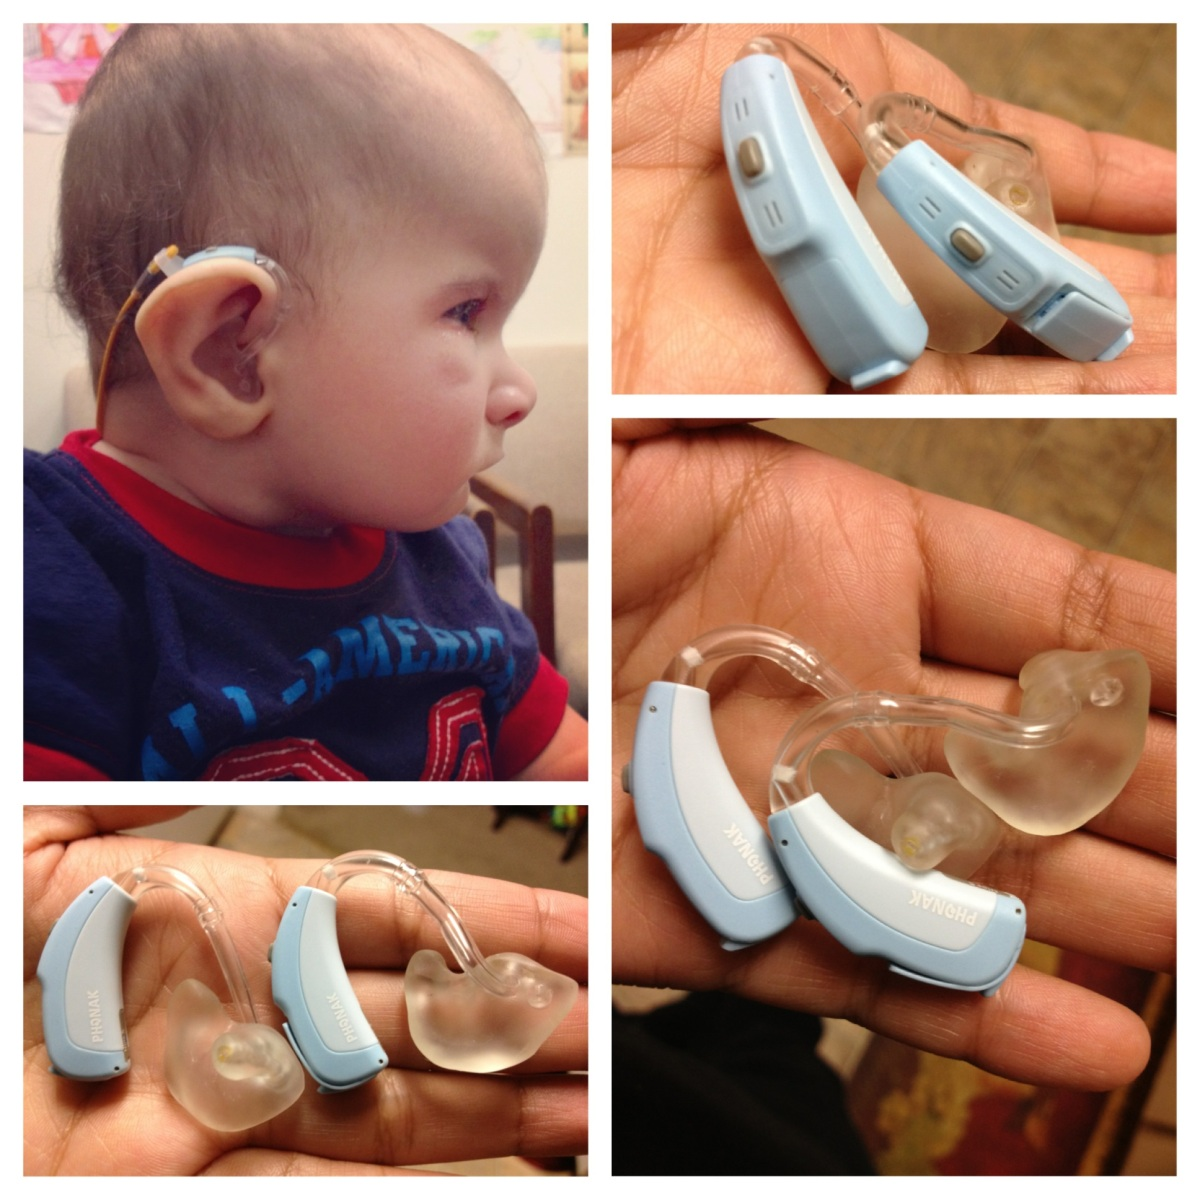 Braxton's Hearing Aids